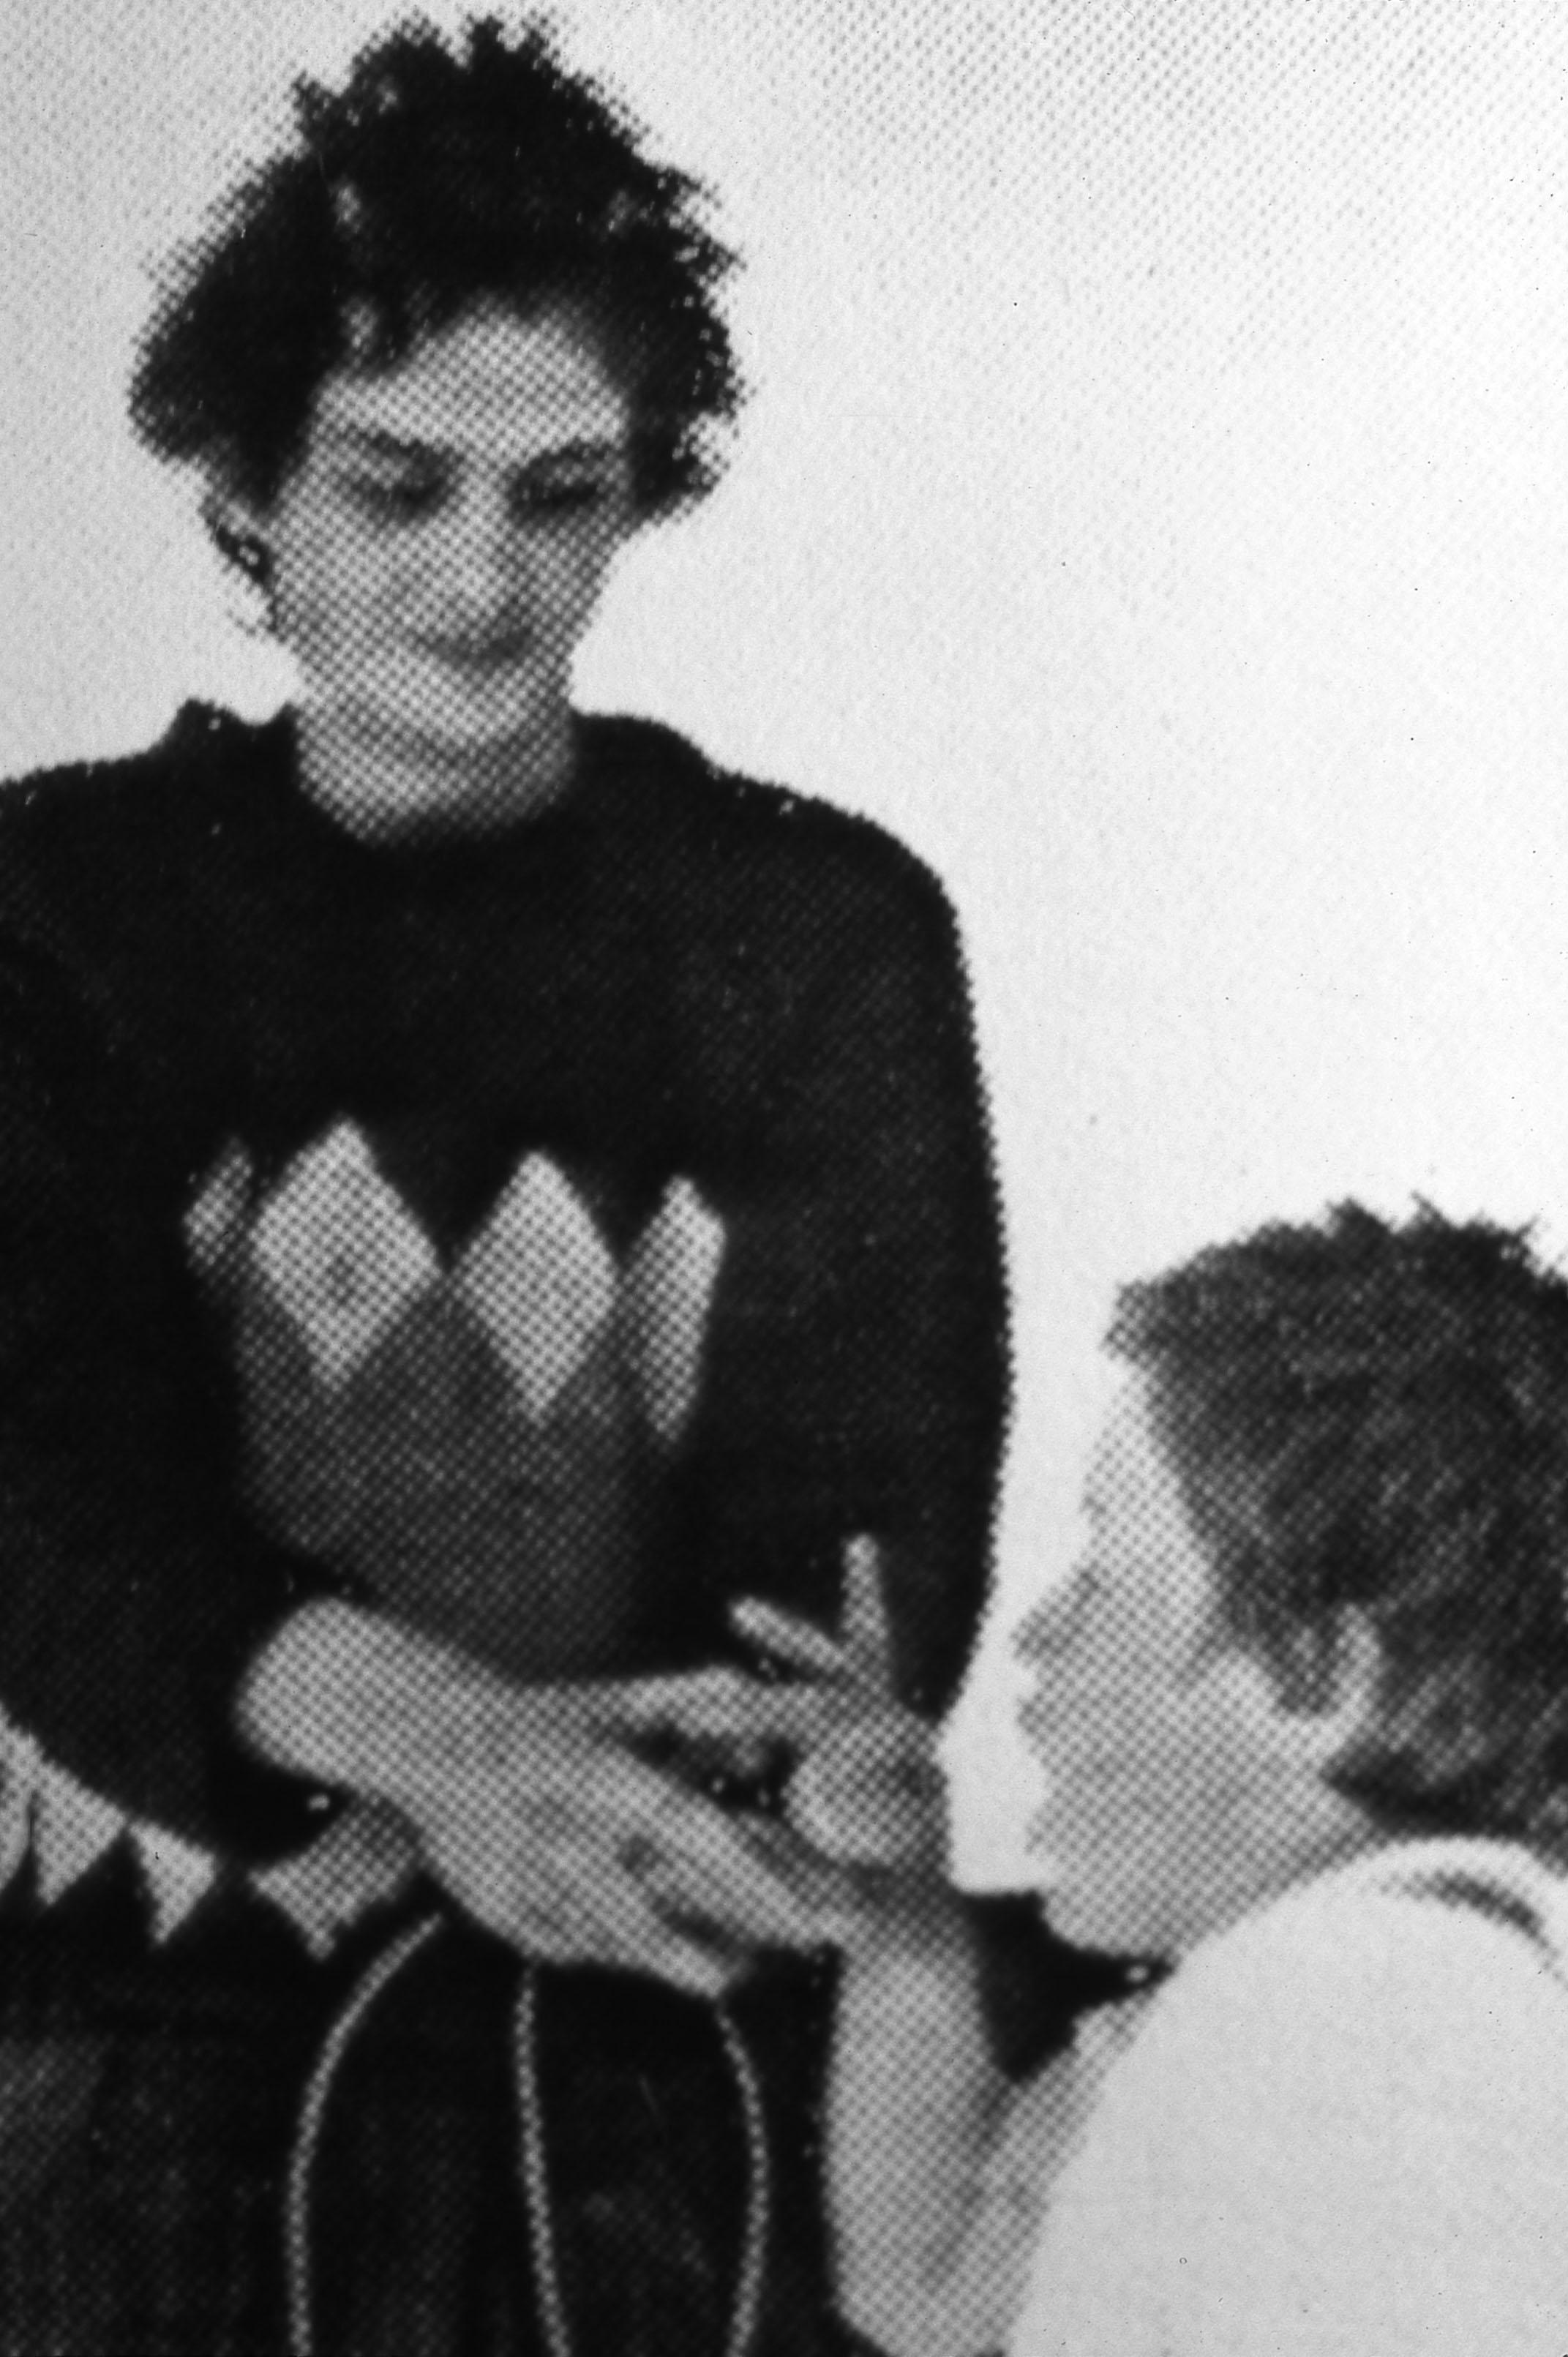 USA + NZ 171 Mark Thomas & audience kid Band Rotunda (Xerox) 1981 GRAY CRO